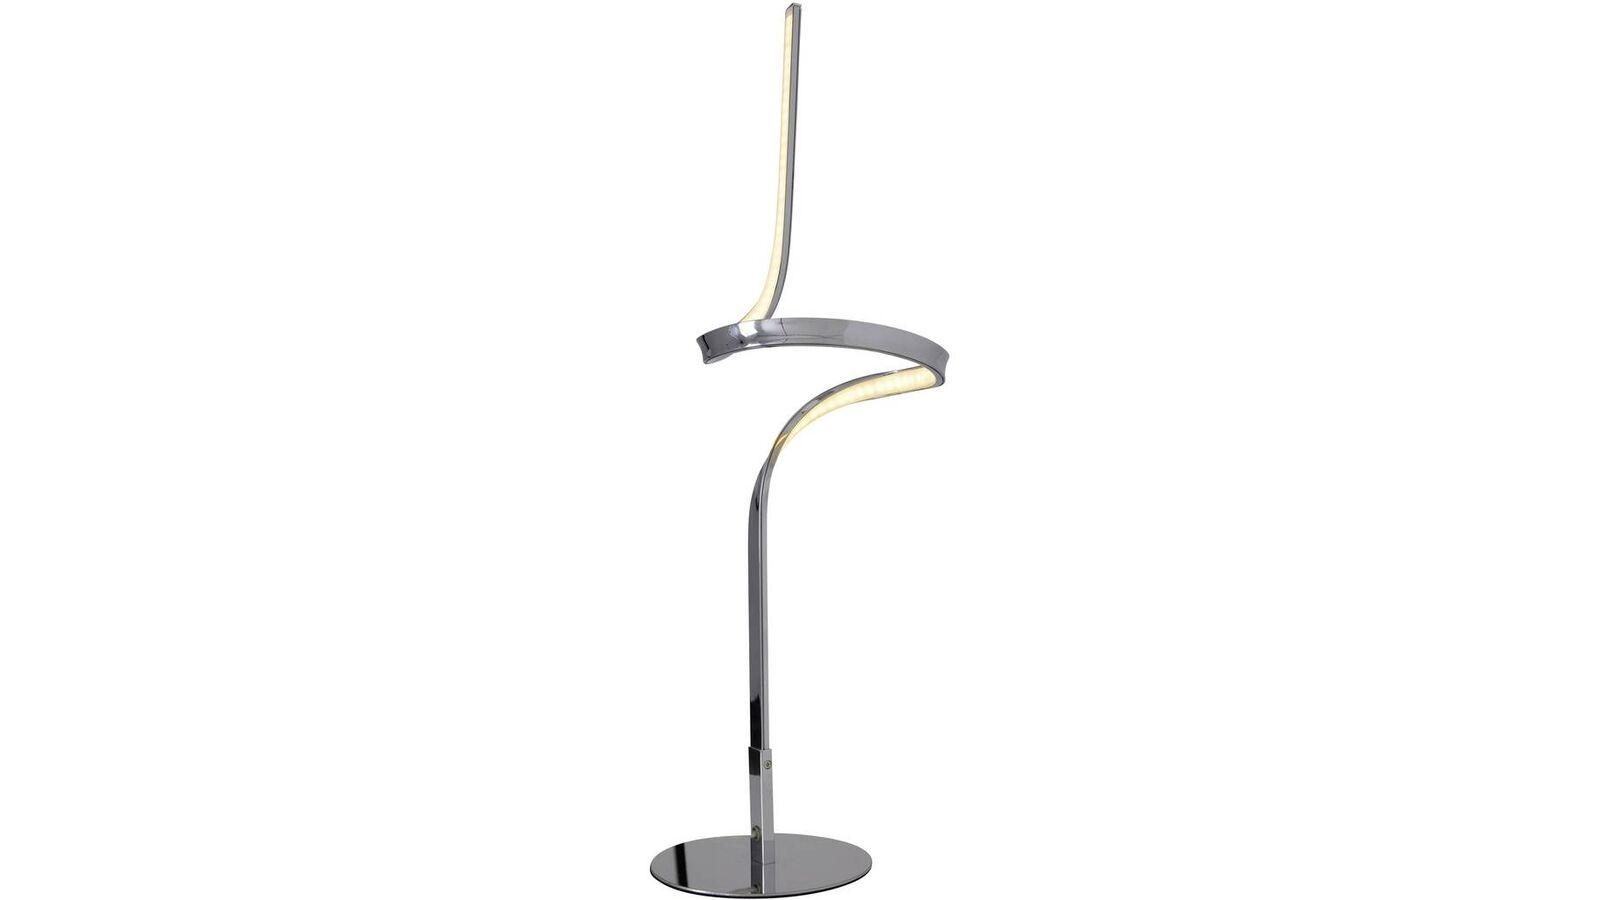 LED Tischleuchte Chrom 63cm Hoch 12W